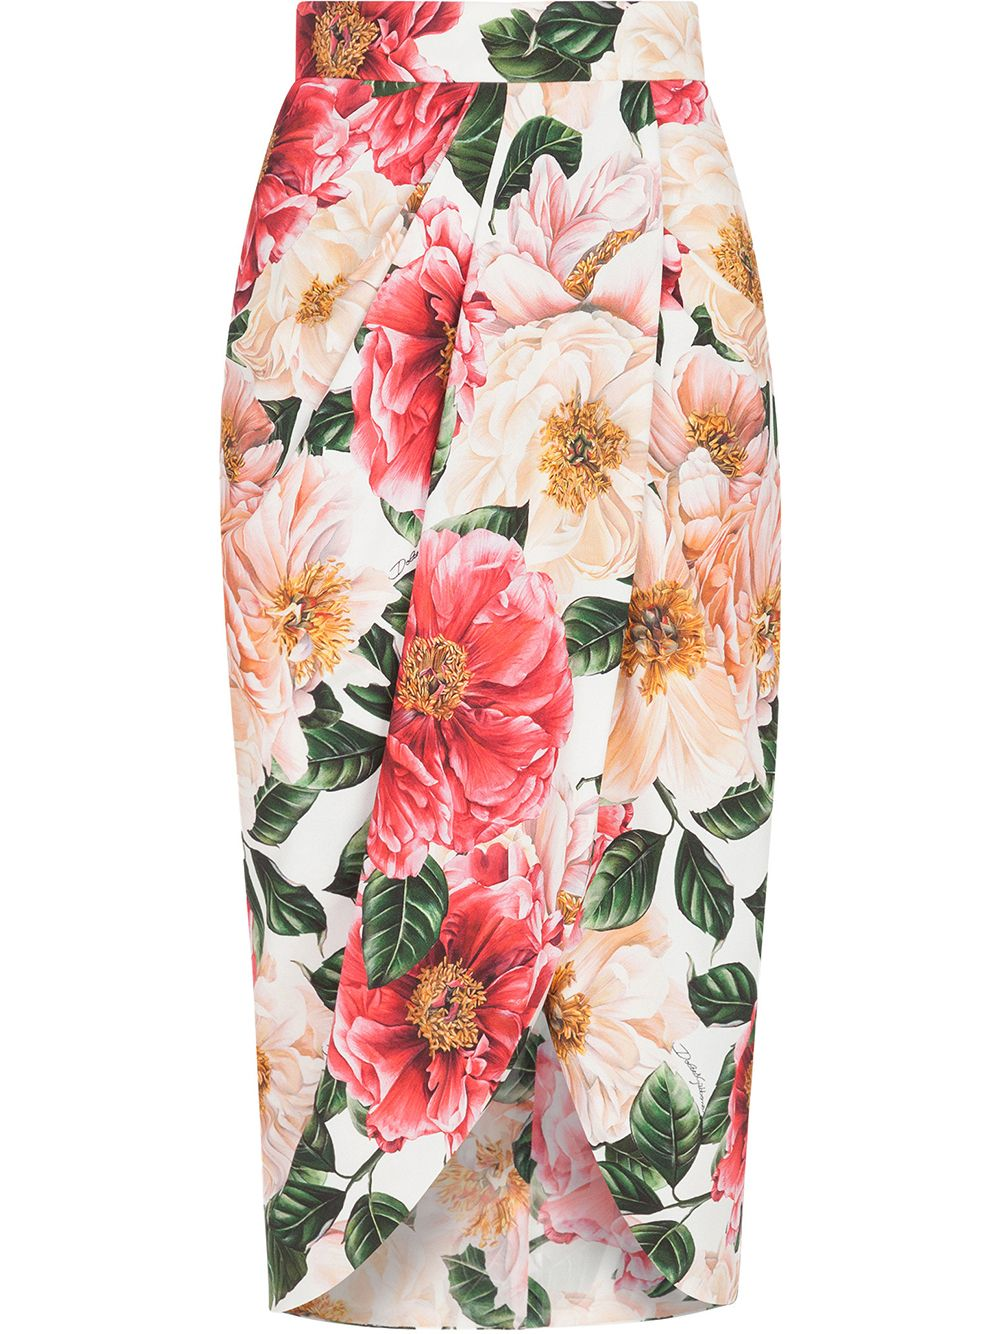 Pink skirt featuring all-over floral print  DOLCE & GABBANA |  | F4BWUT-FSRMUHA2AI